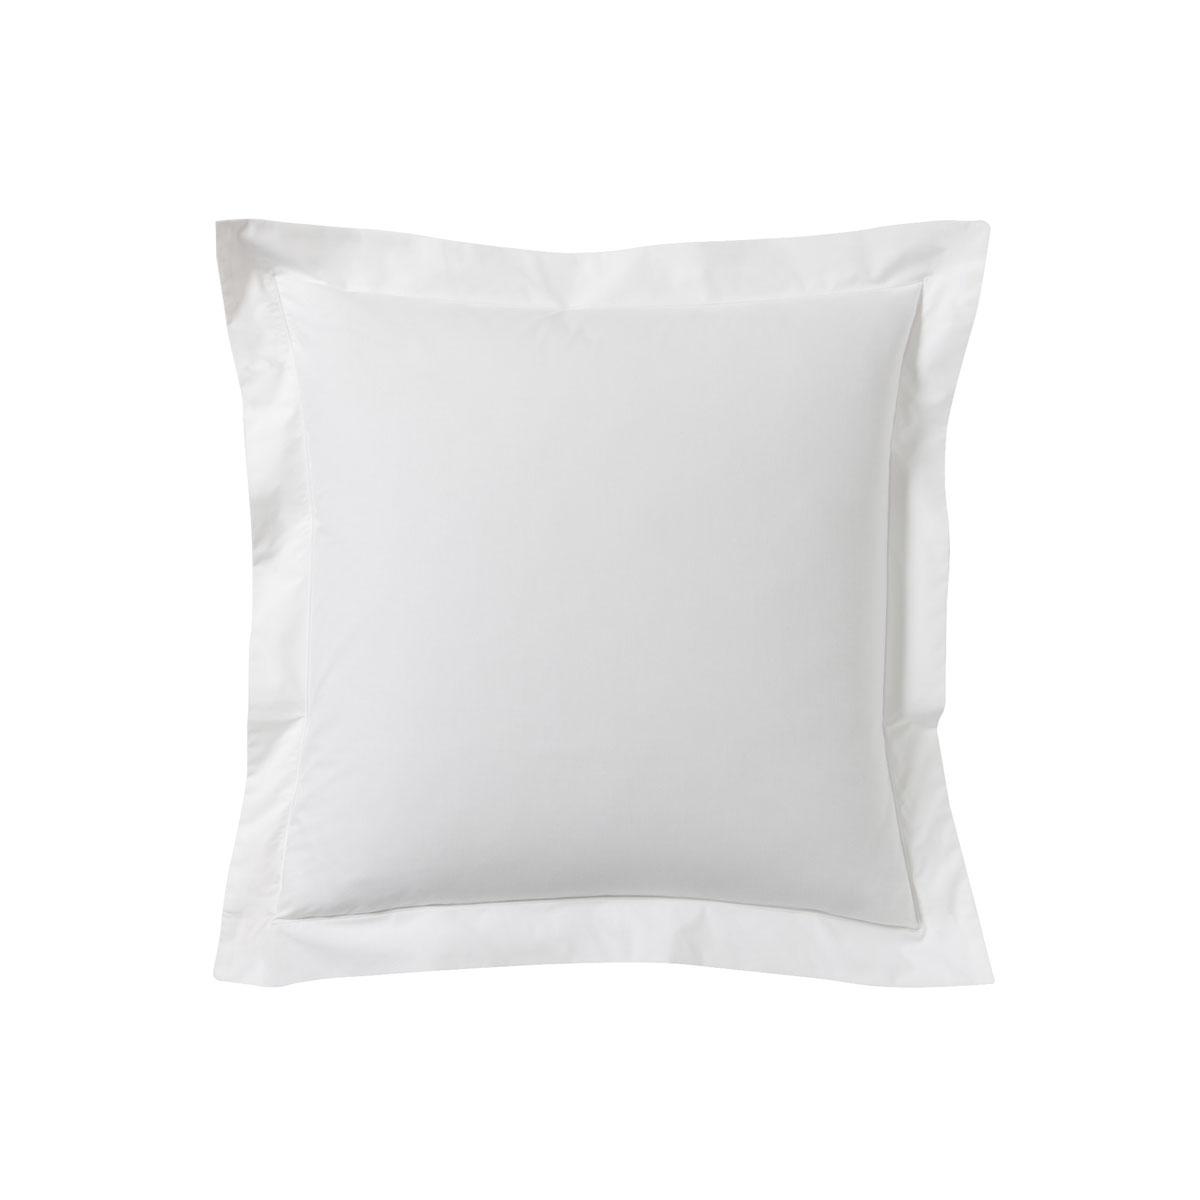 Taie d'oreiller unie en coton, Made in France blanc 50x70